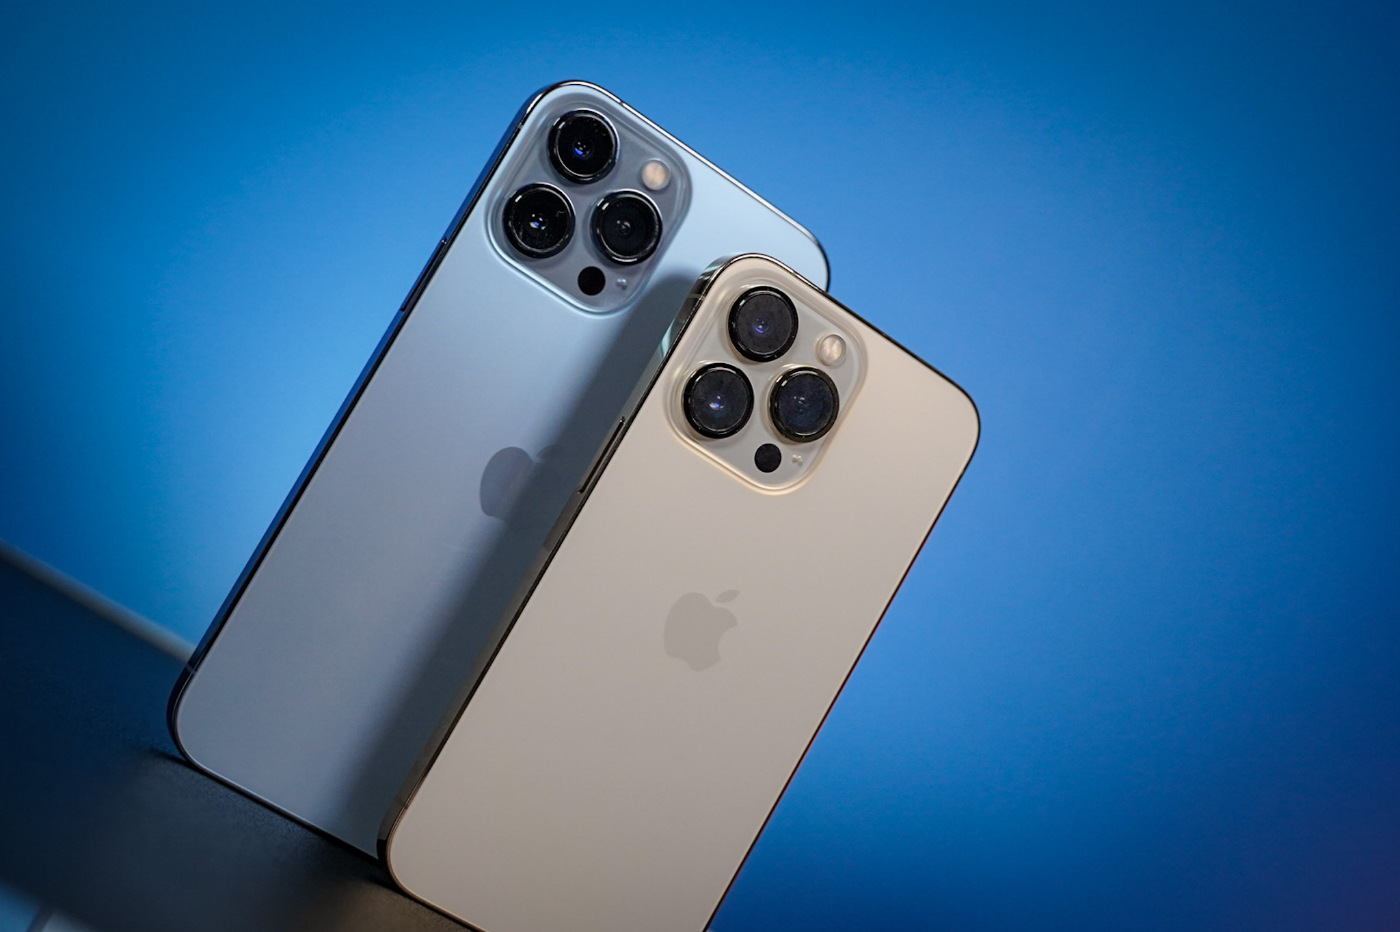 iPhone 13 pro vs pro max design